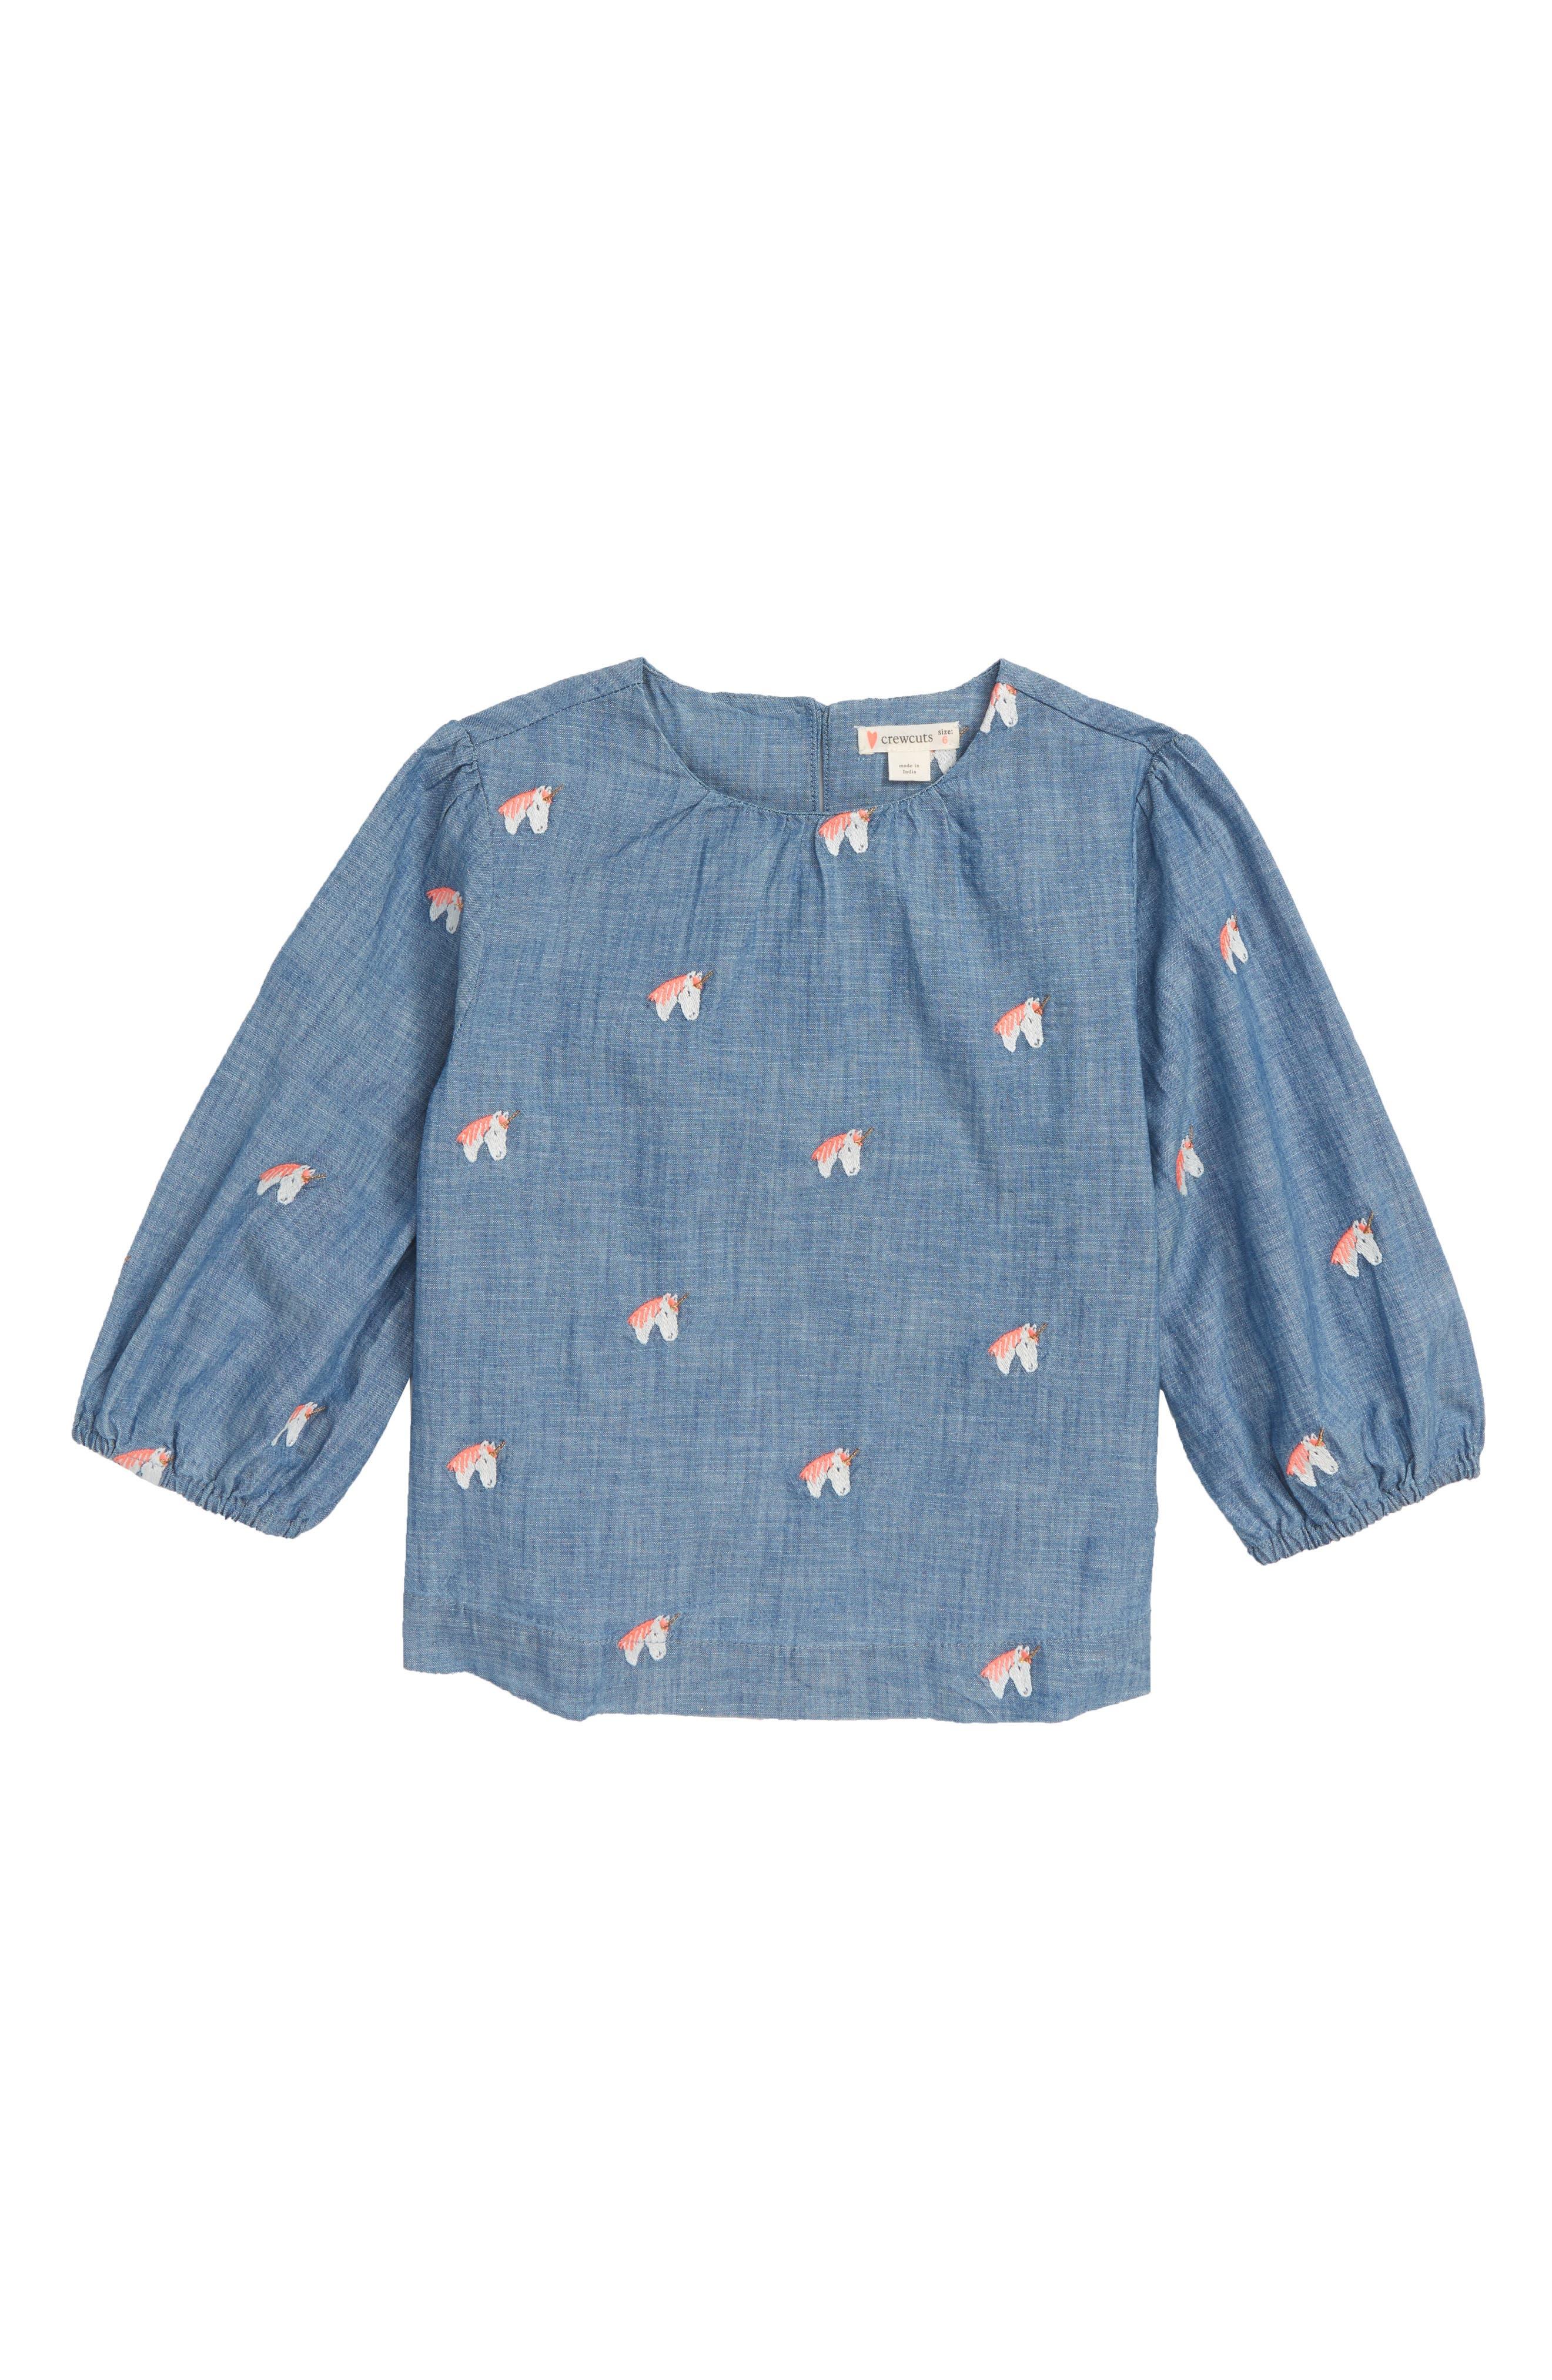 CREWCUTS BY J.CREW Unicorn Chambray Popover Shirt, Main, color, 400